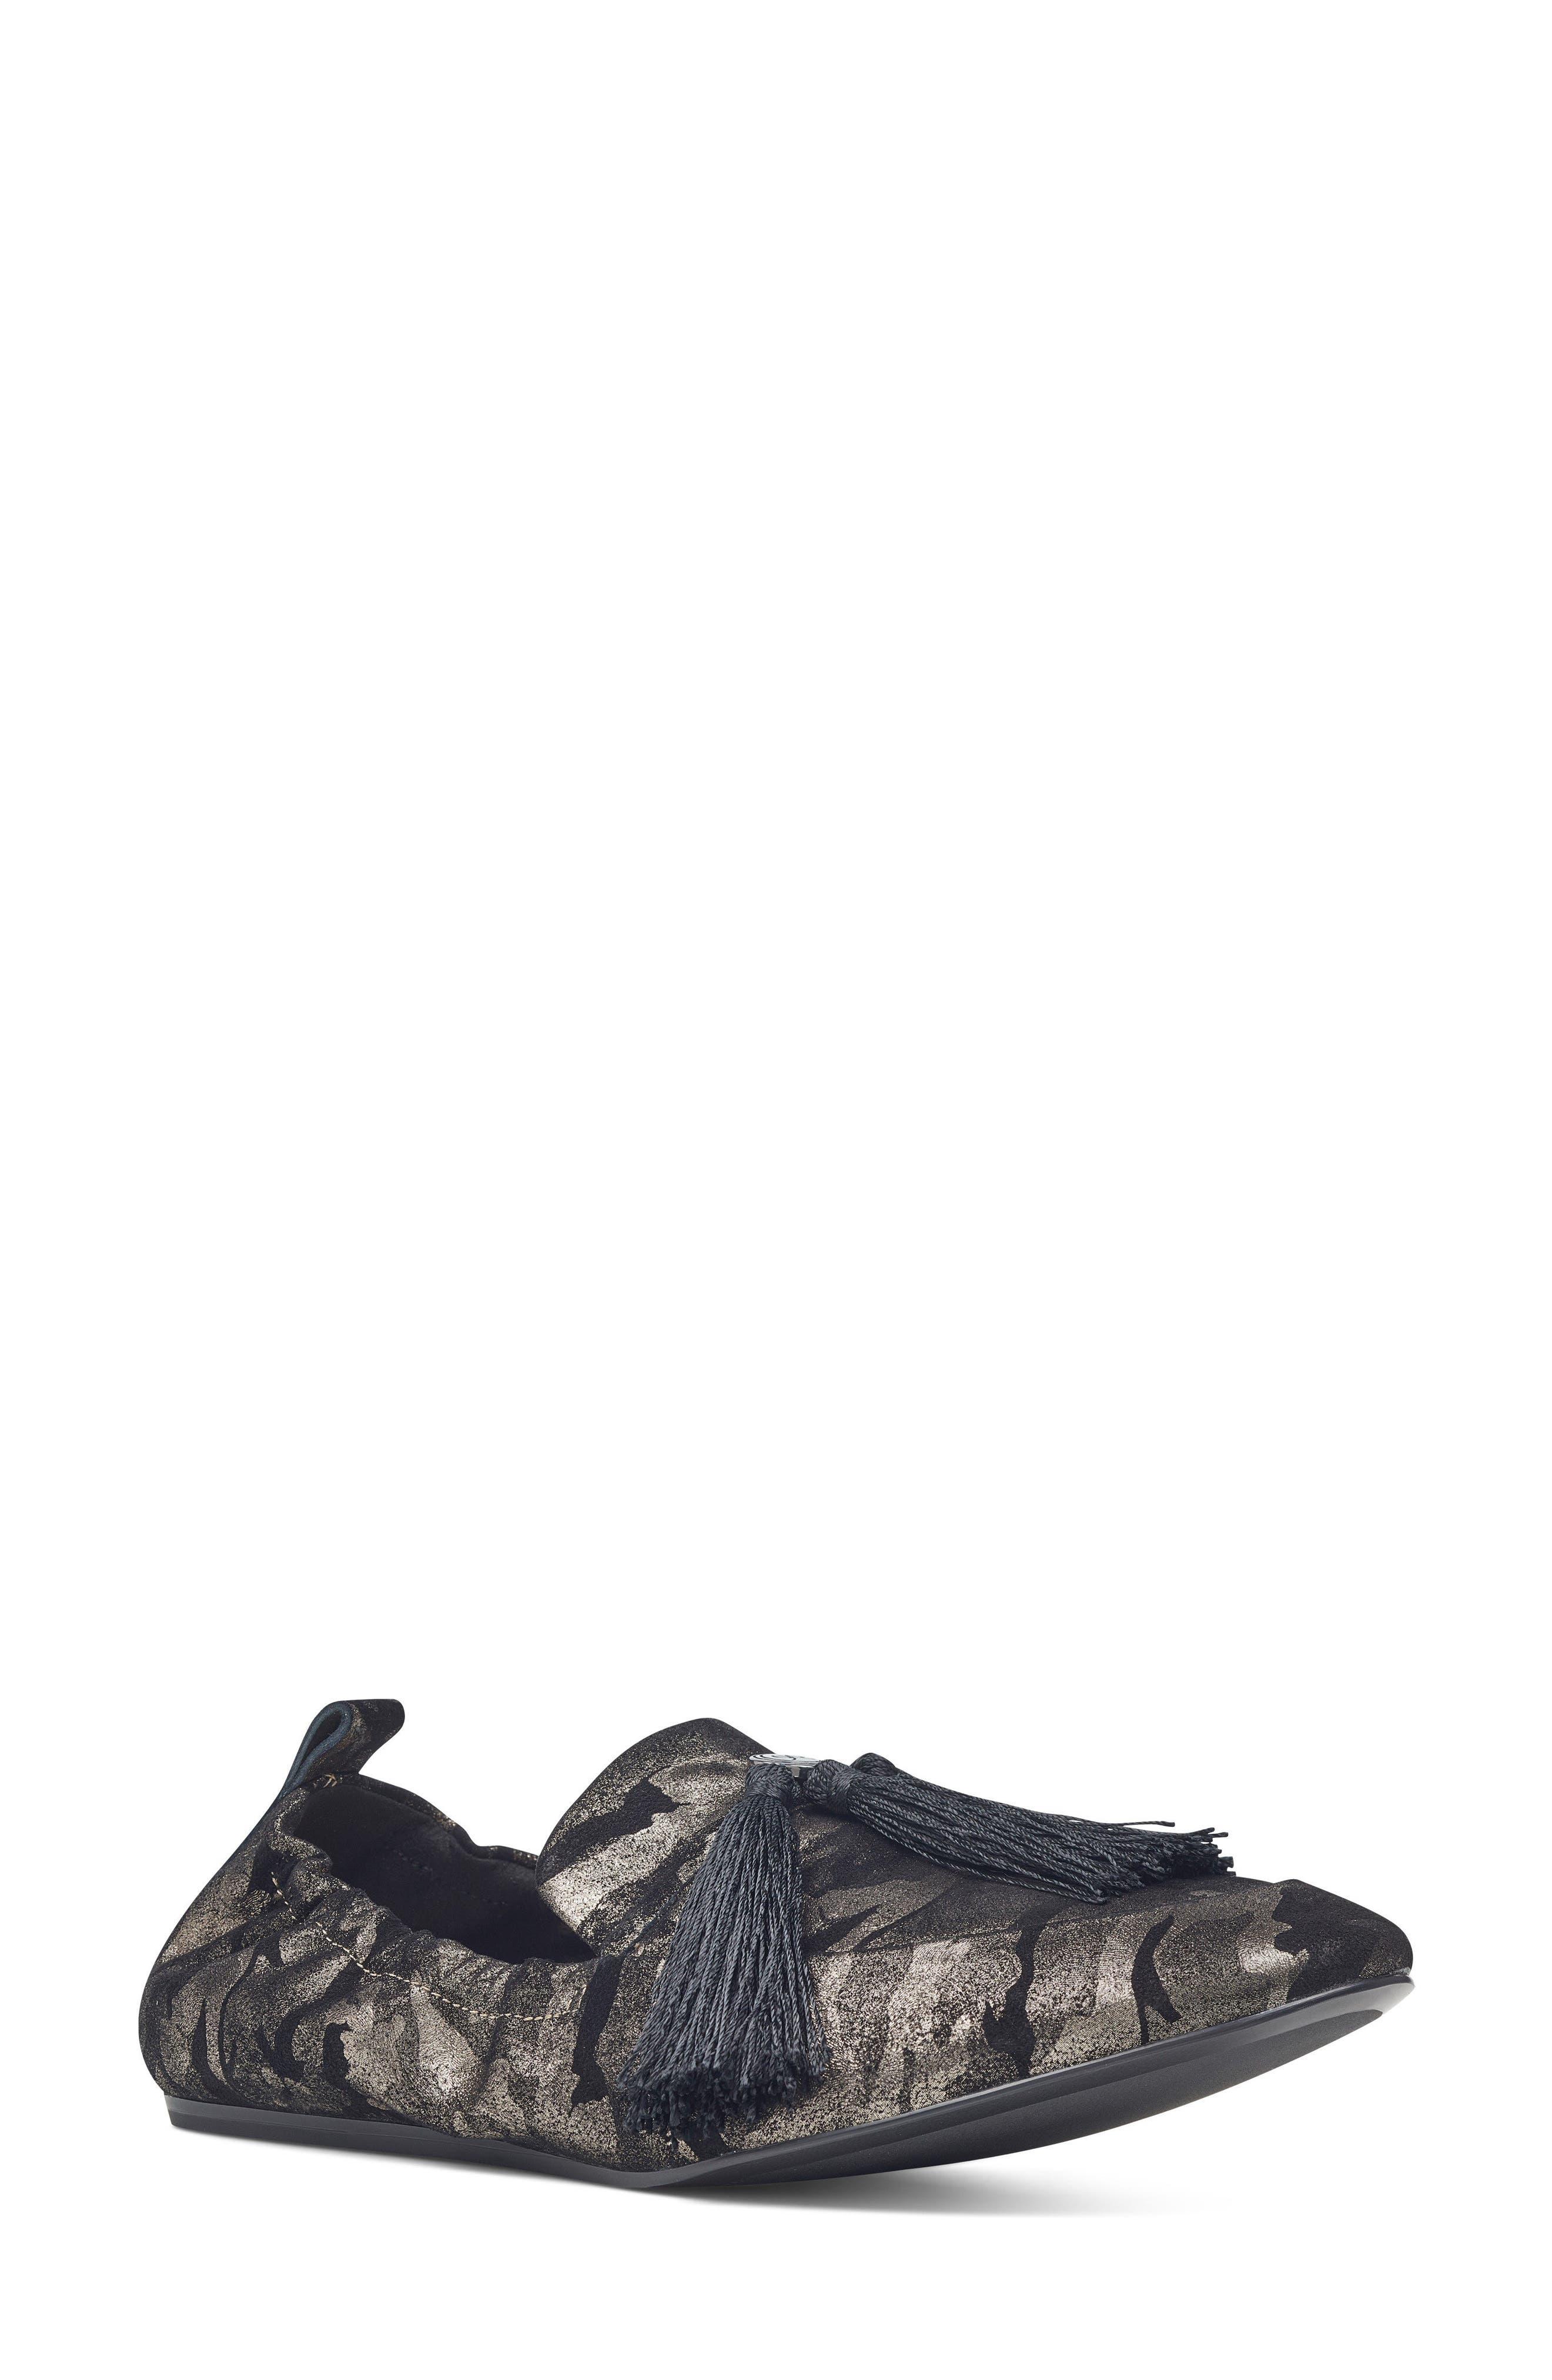 Ballard Tassel Loafer Flat,                             Main thumbnail 1, color,                             Pewter Leather